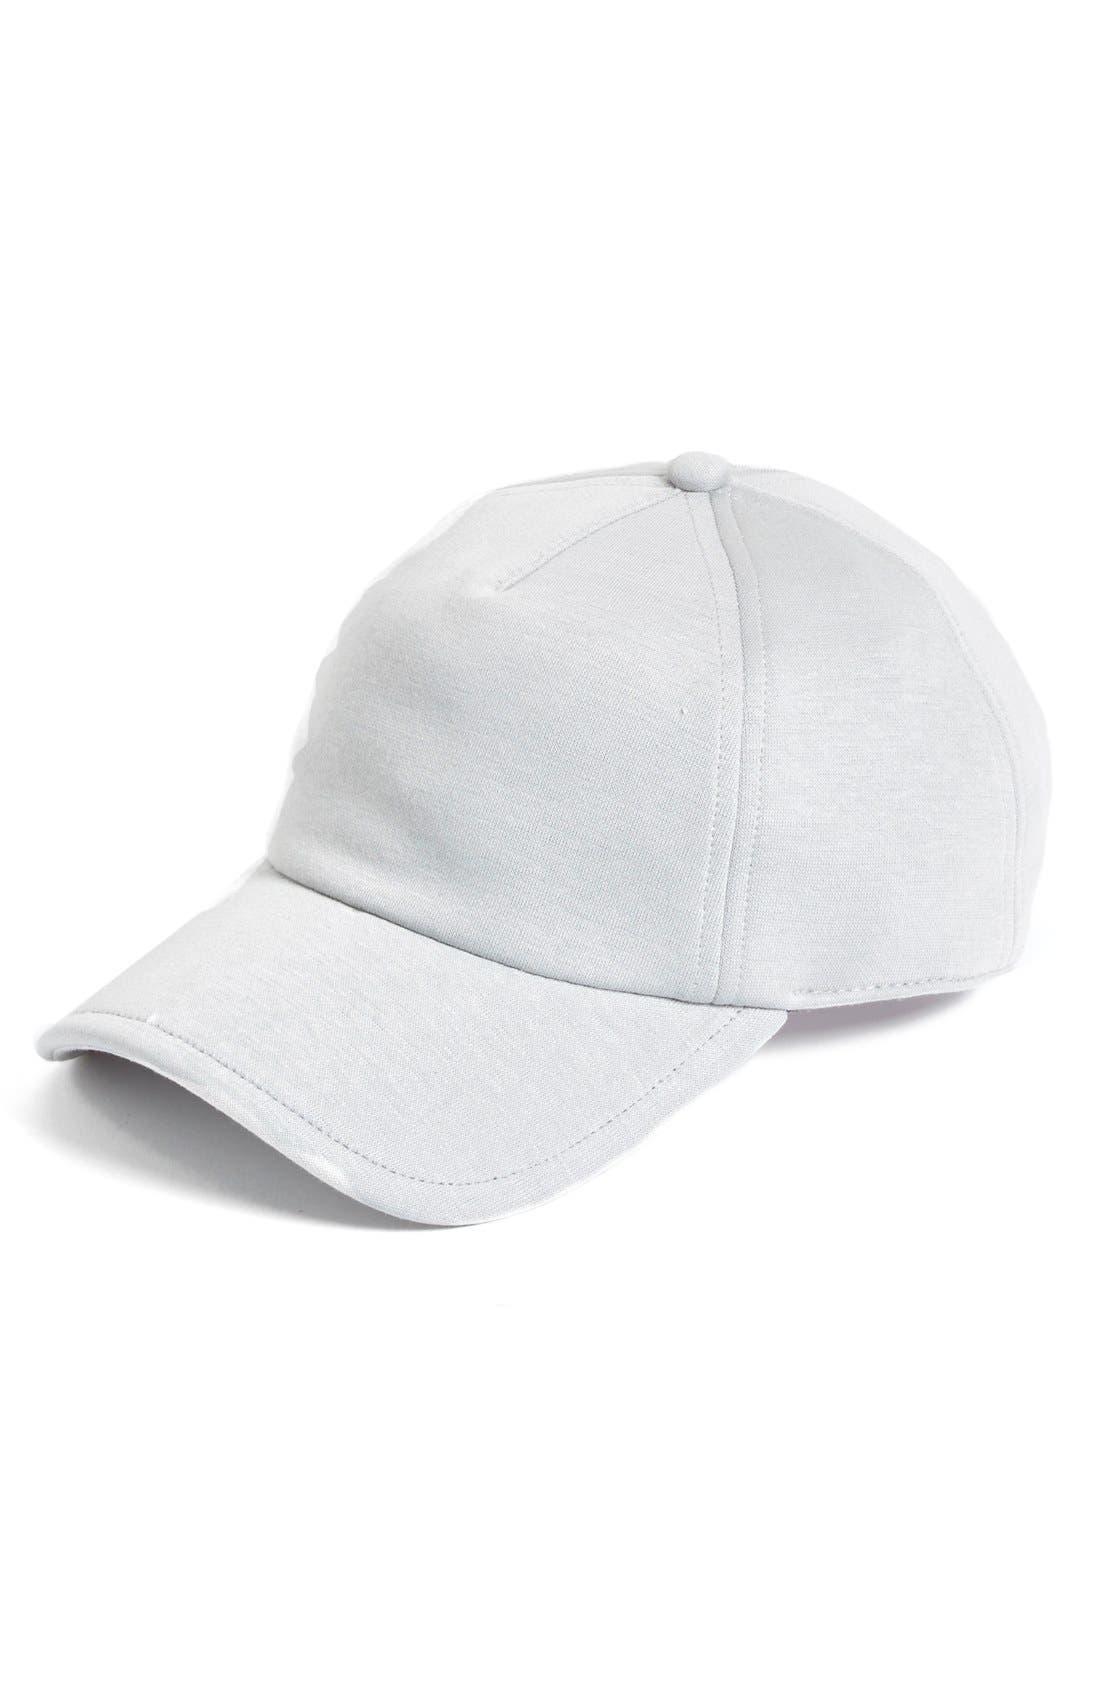 Alternate Image 1 Selected - rag & bone 'Marilyn' Baseball Cap